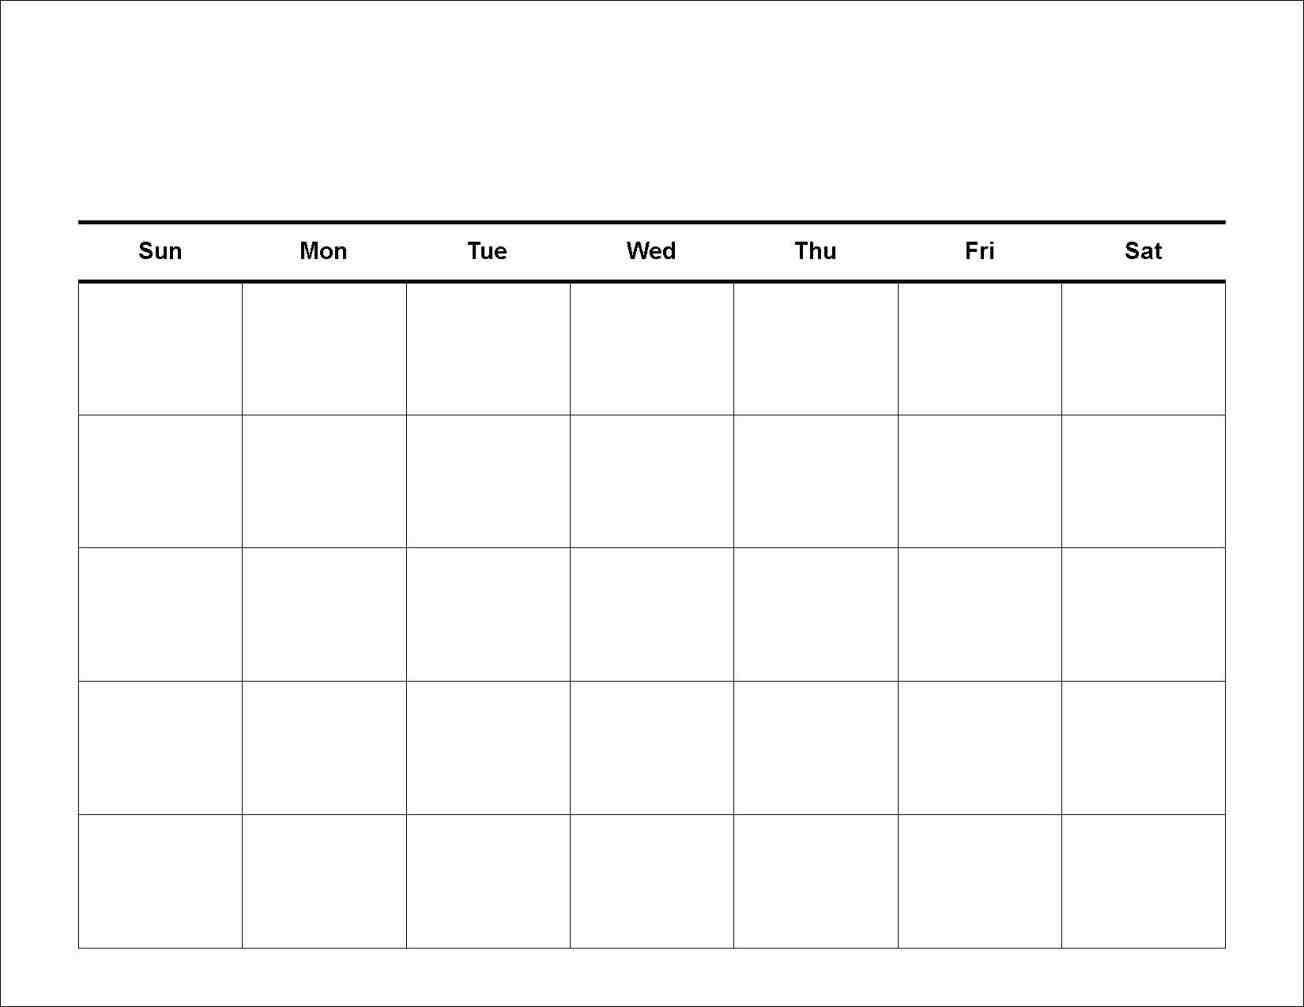 Free 7 Day Blank Calendar | Igotlockedout in 7 Day Week Calendar Template